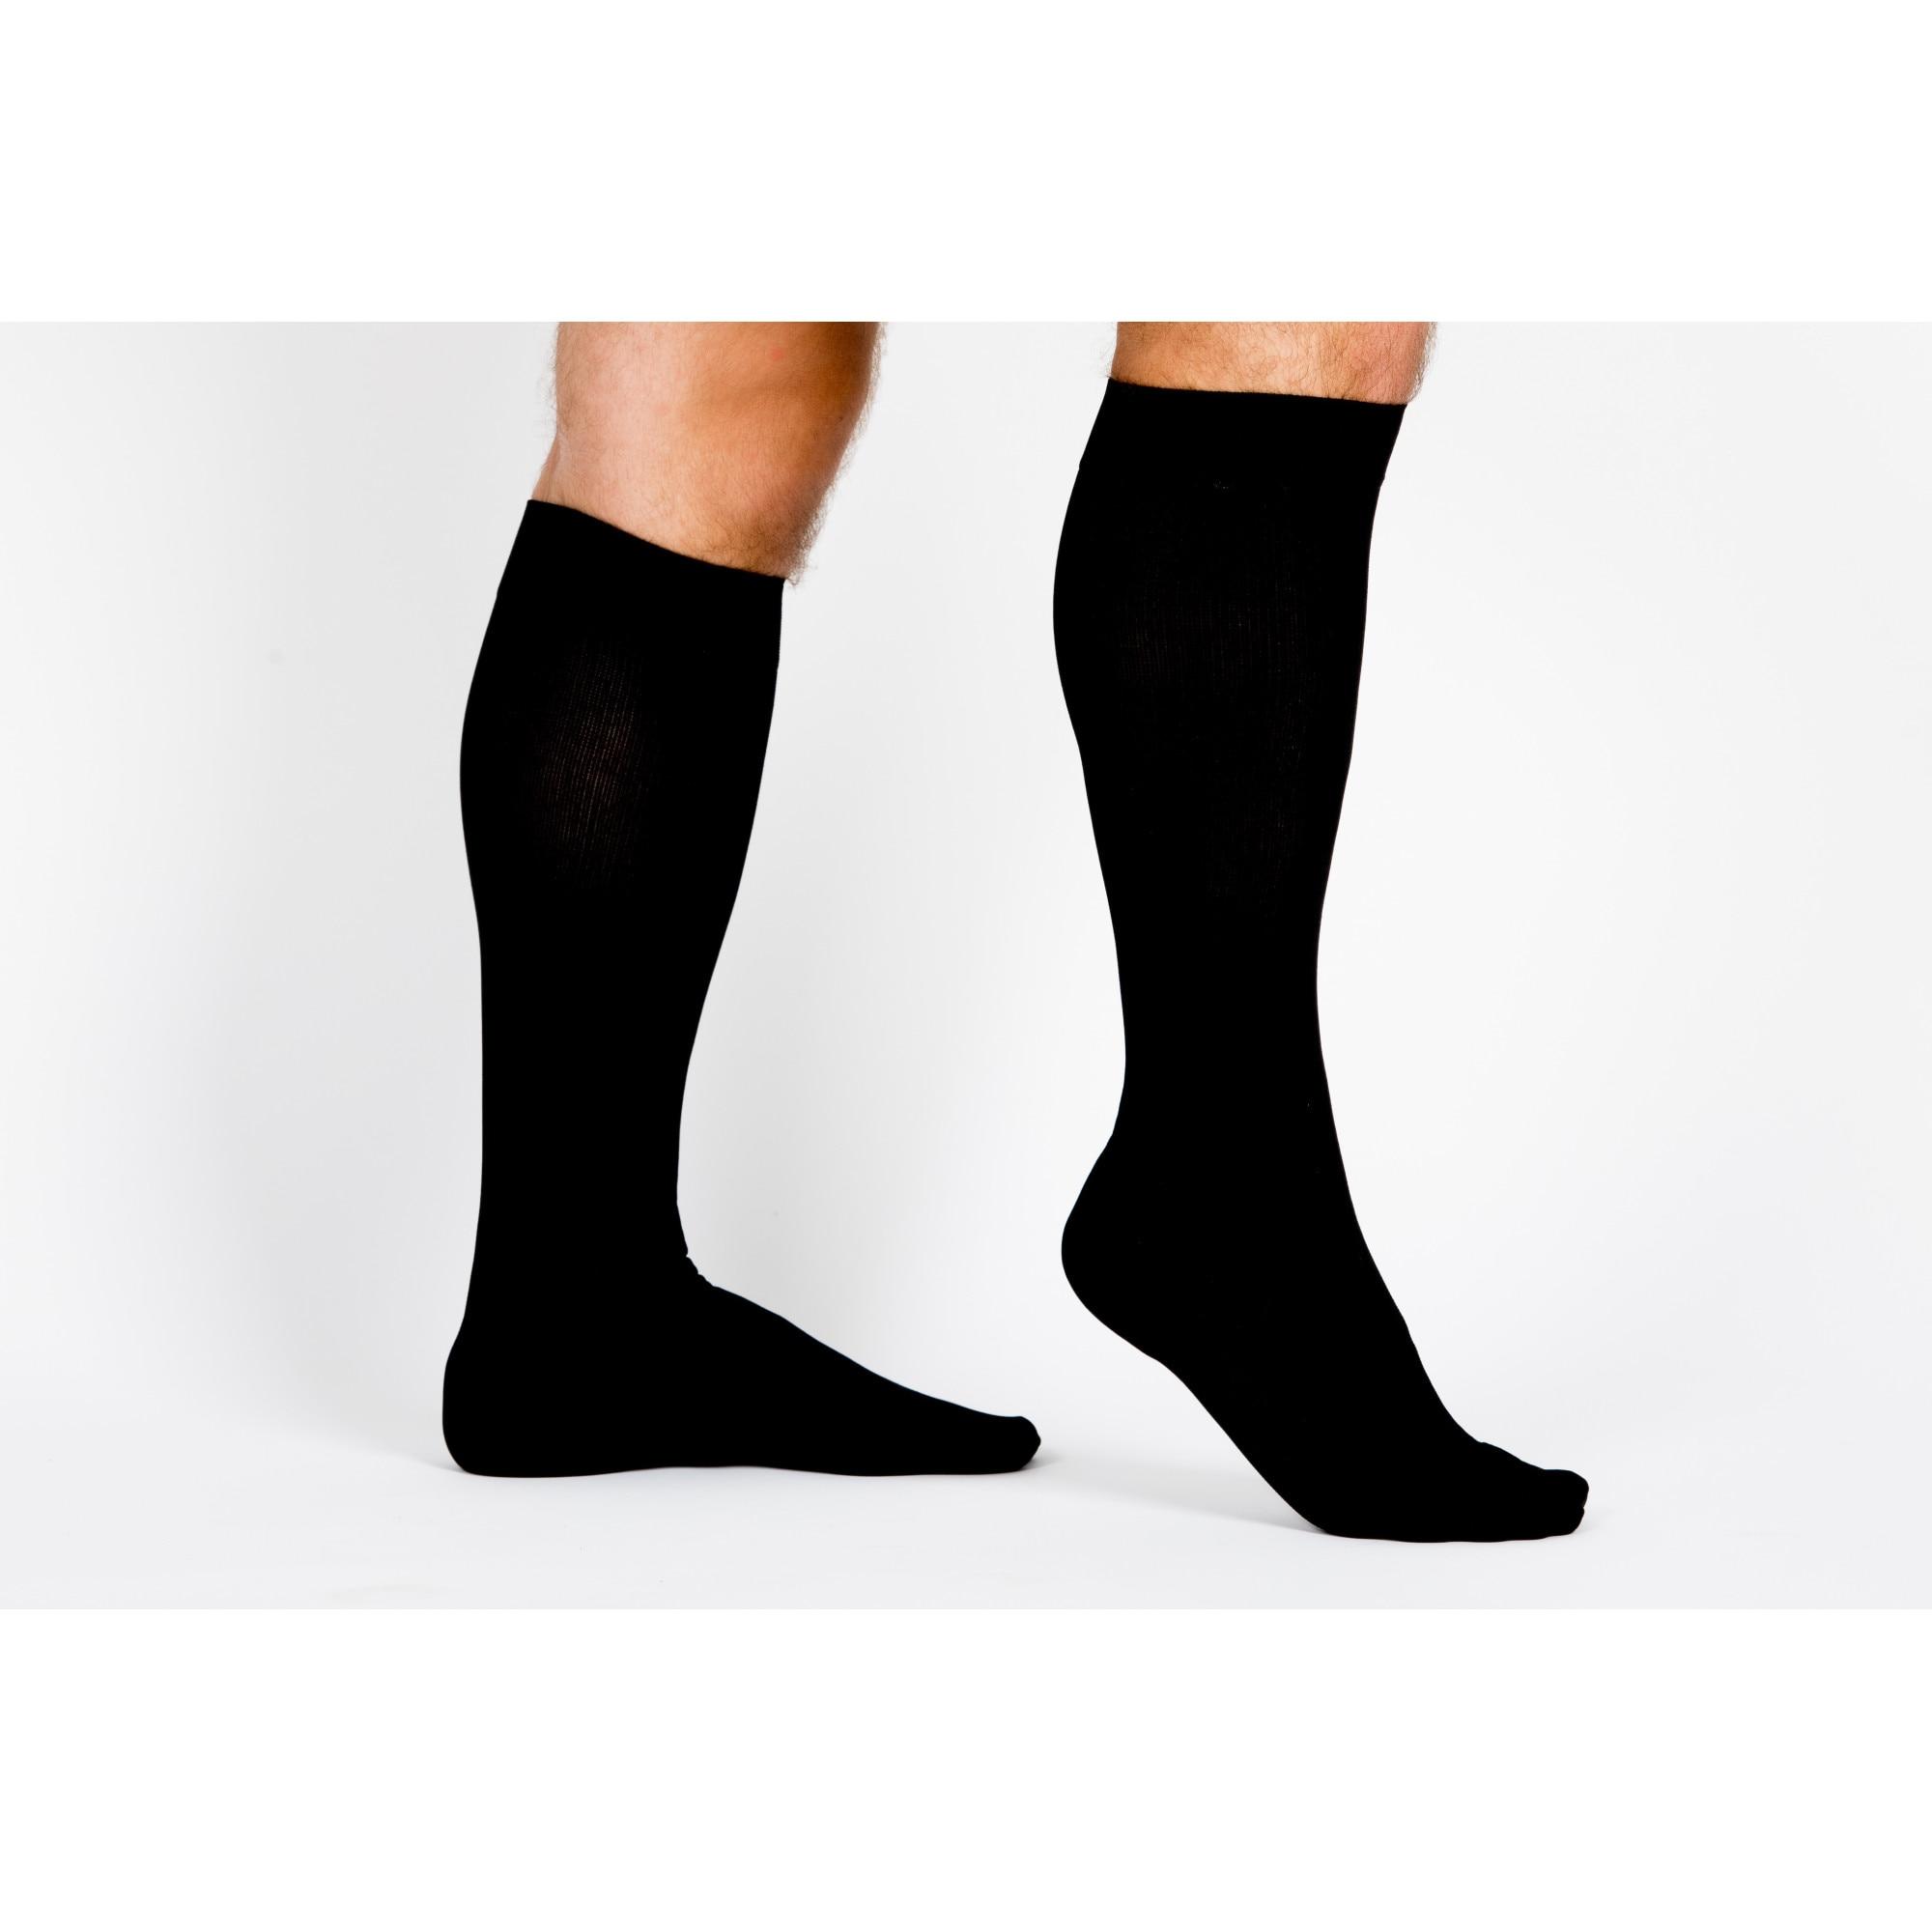 Ciorapi Medicinali Compresivi, Varice | Ciorapi Medicinali Barbati